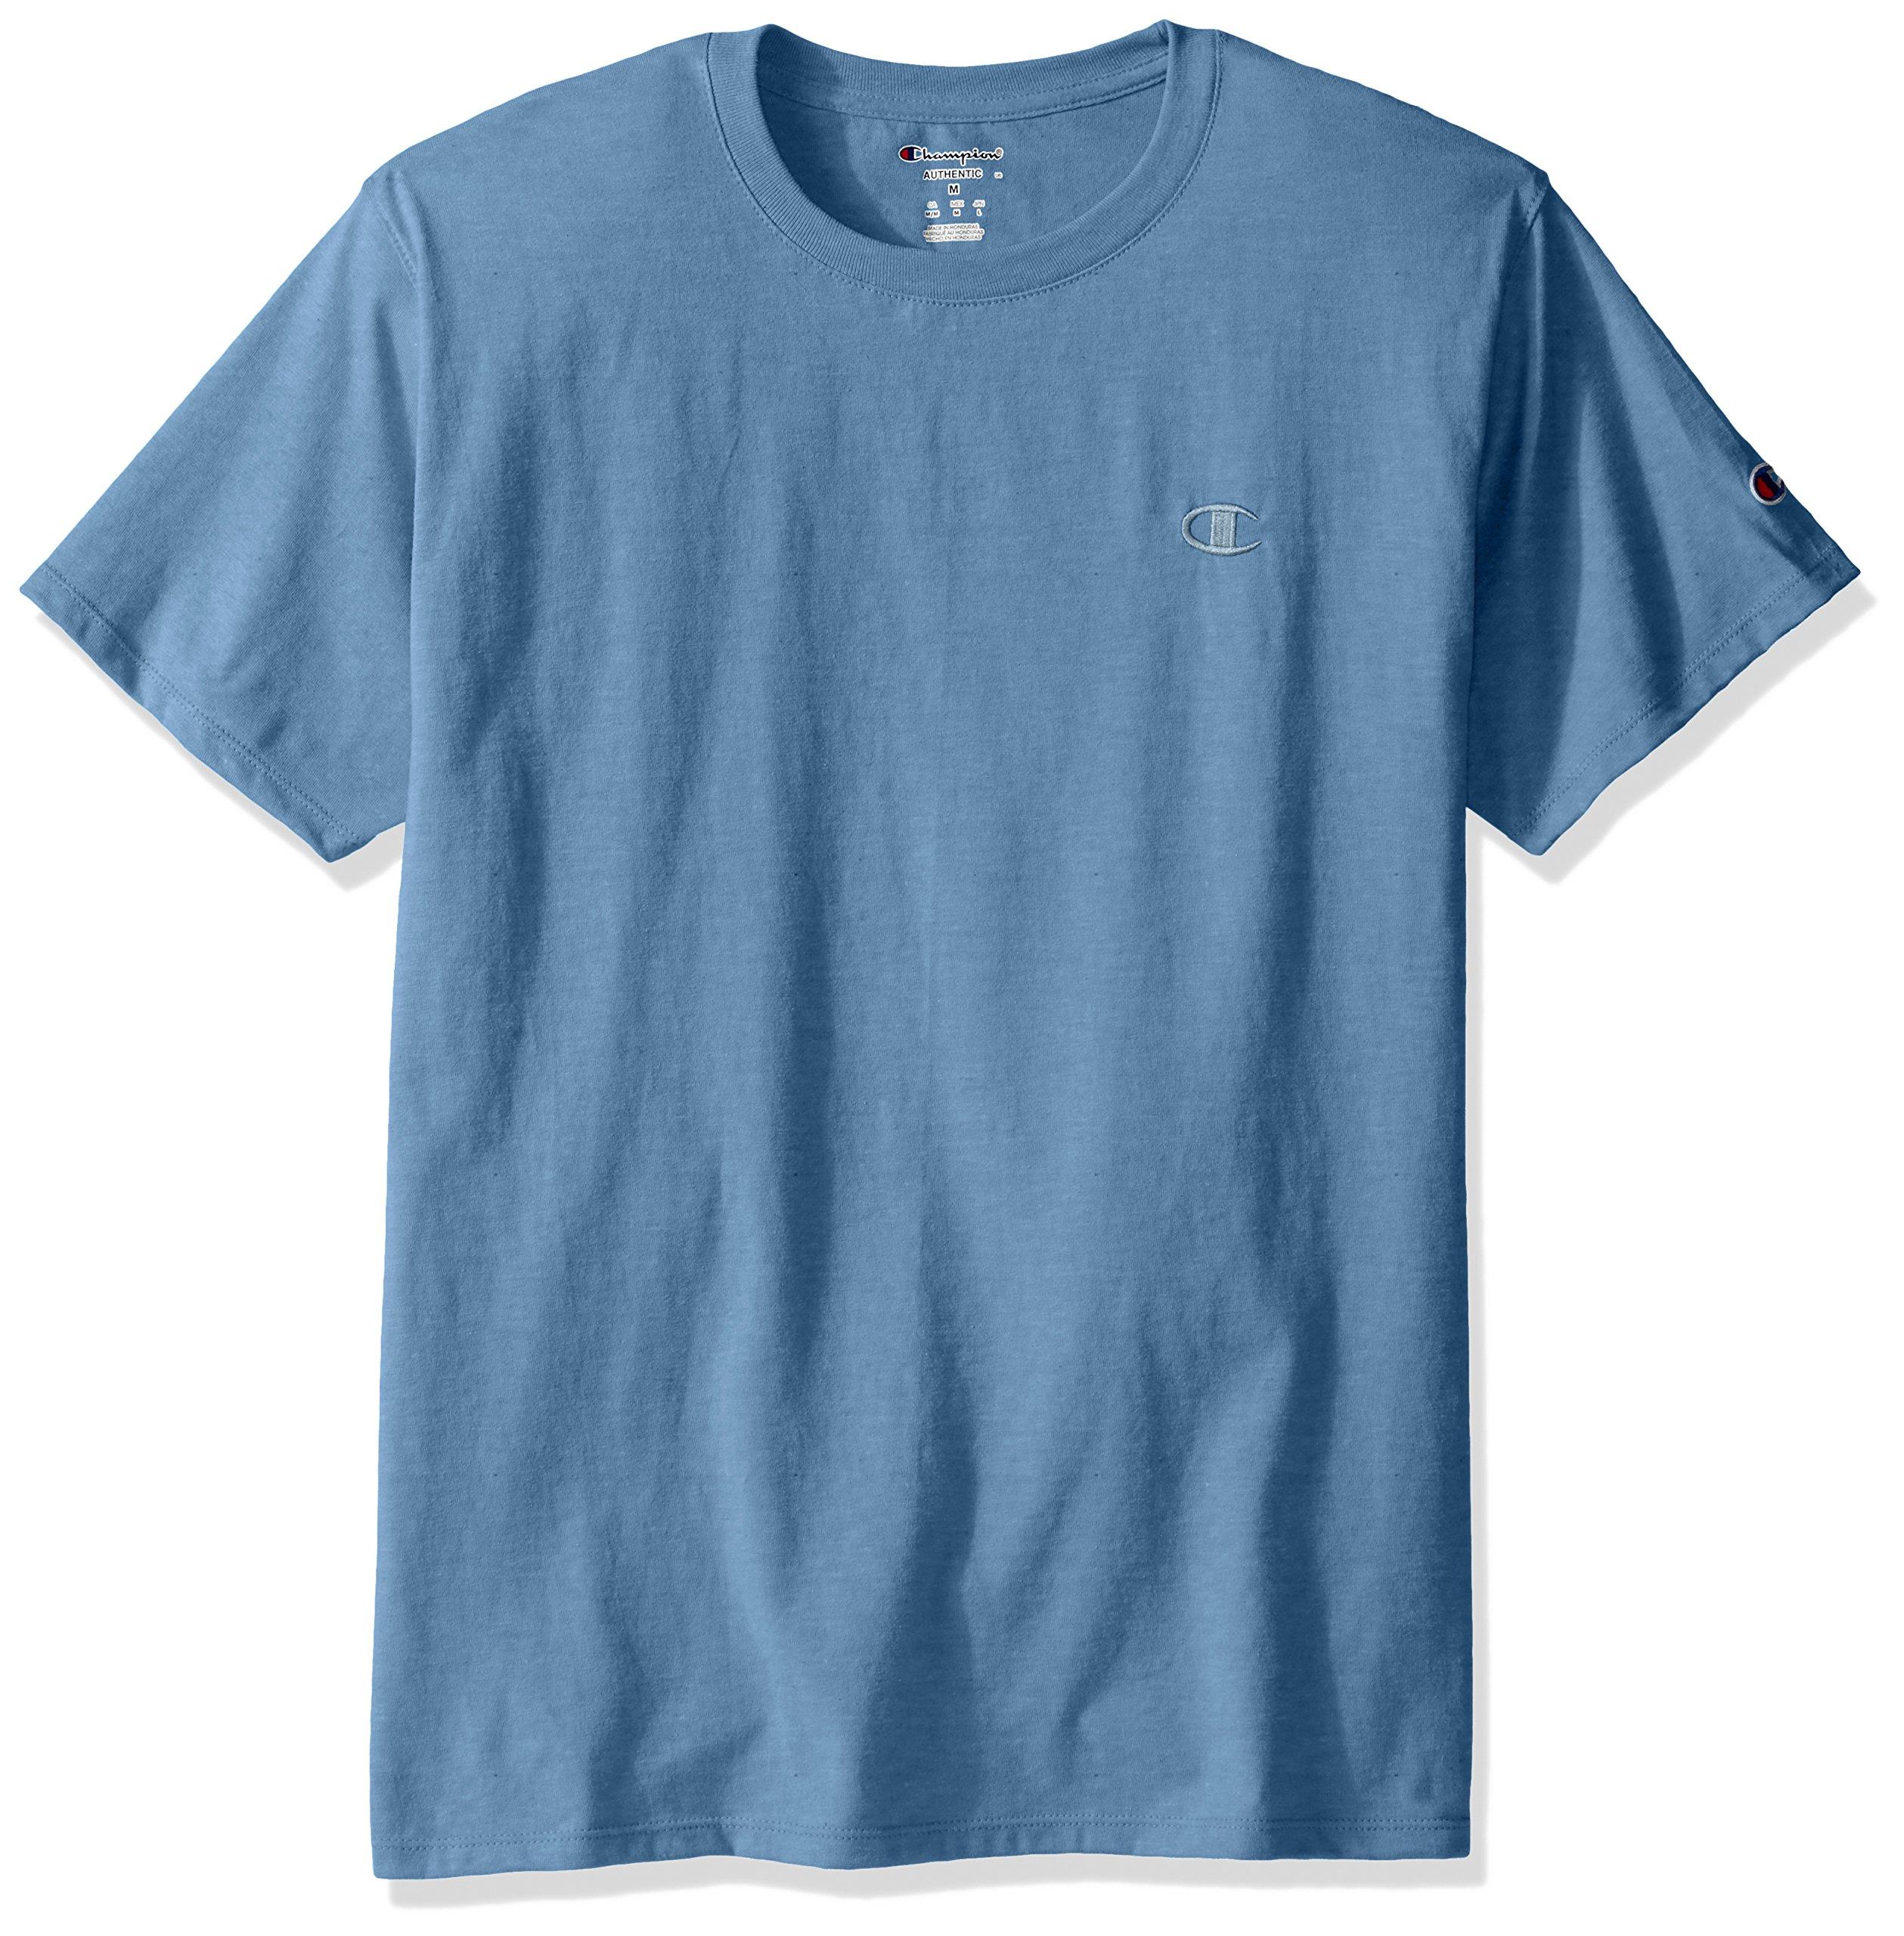 f1a92cc19a72 Galleon - Champion Men's Classic Jersey T-Shirt, Swiss Blue, M